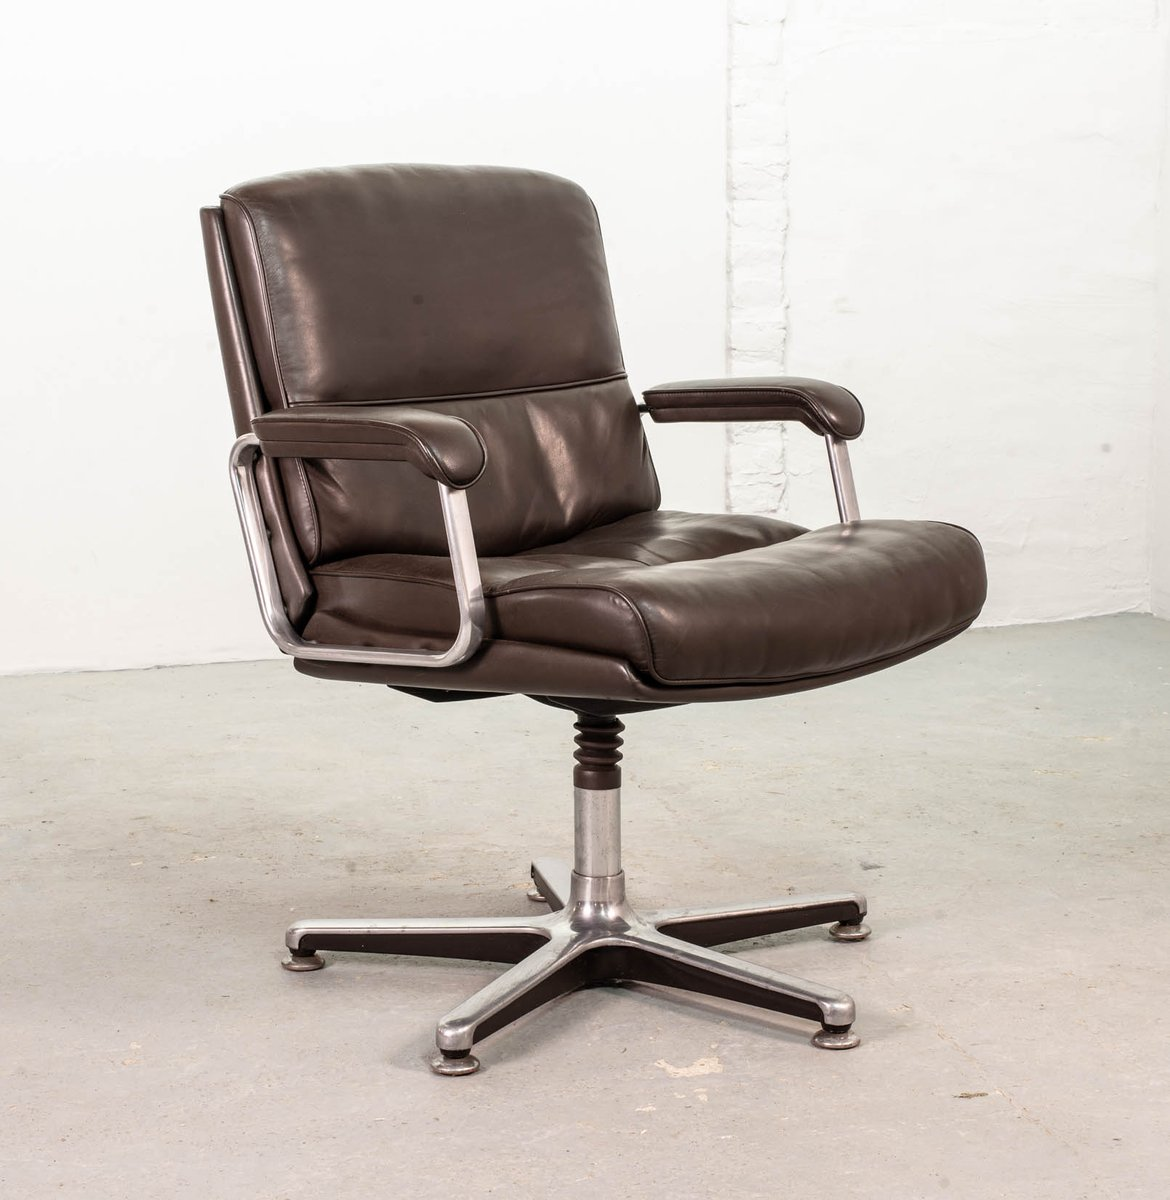 sedie da scrivania in pelle marrone di drabert anni 39 70